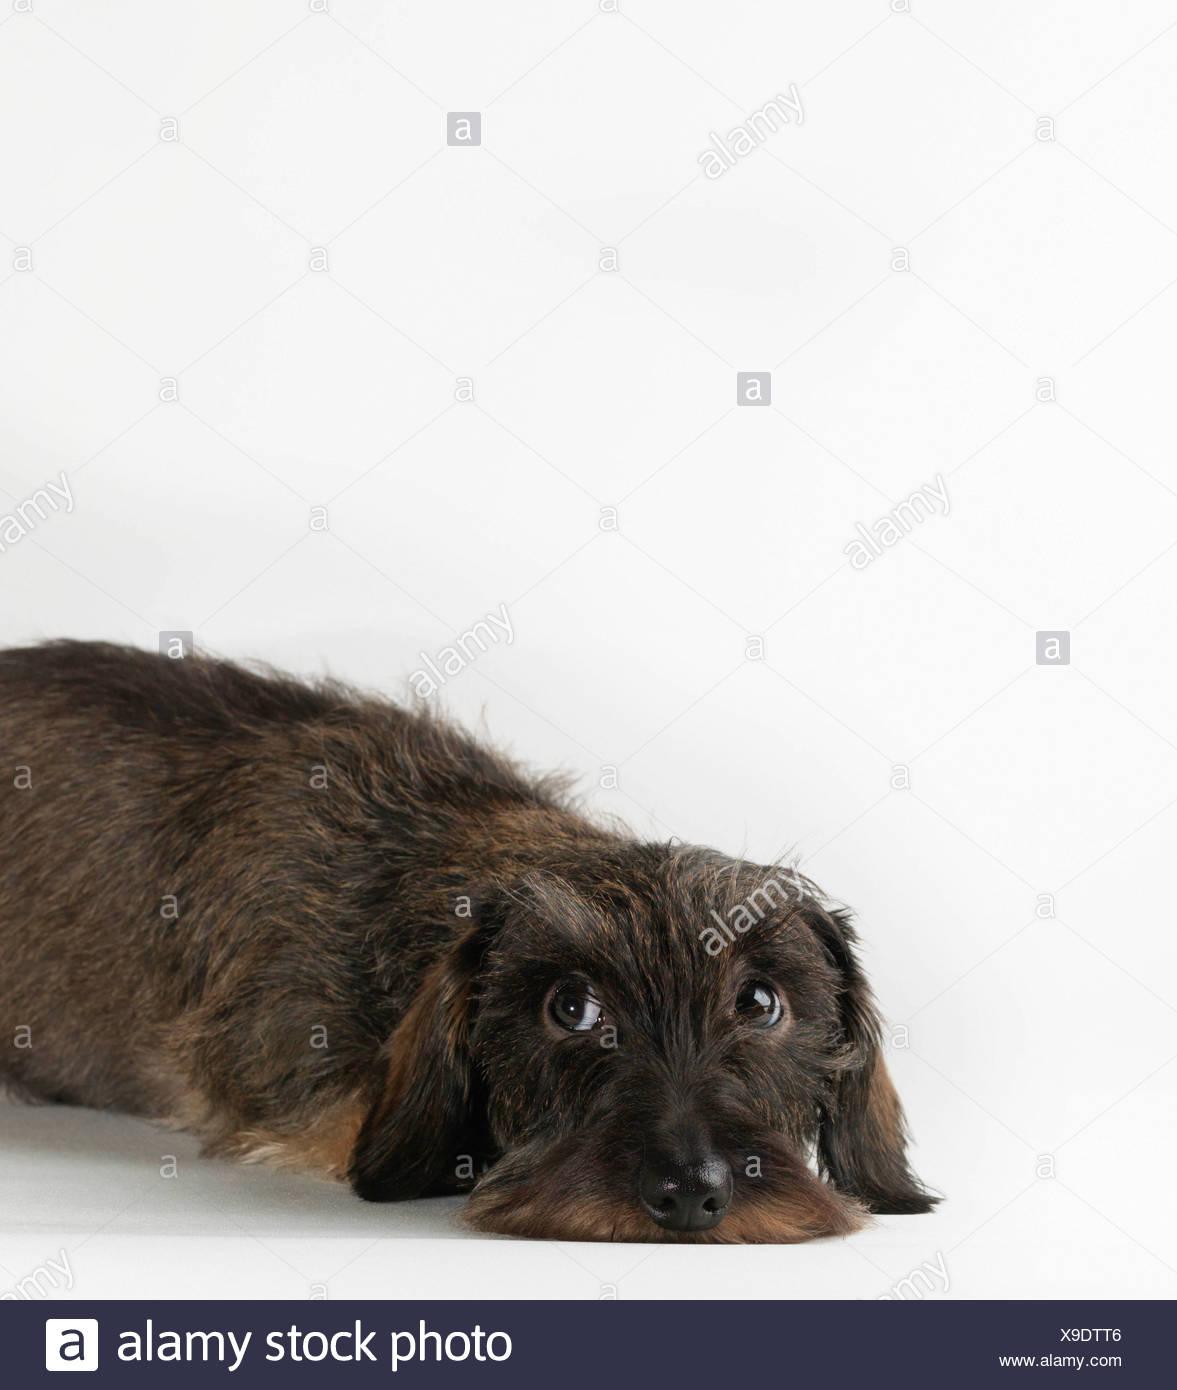 Long Haired Dachshund Dog Lying Stock Photos & Long Haired Dachshund ...